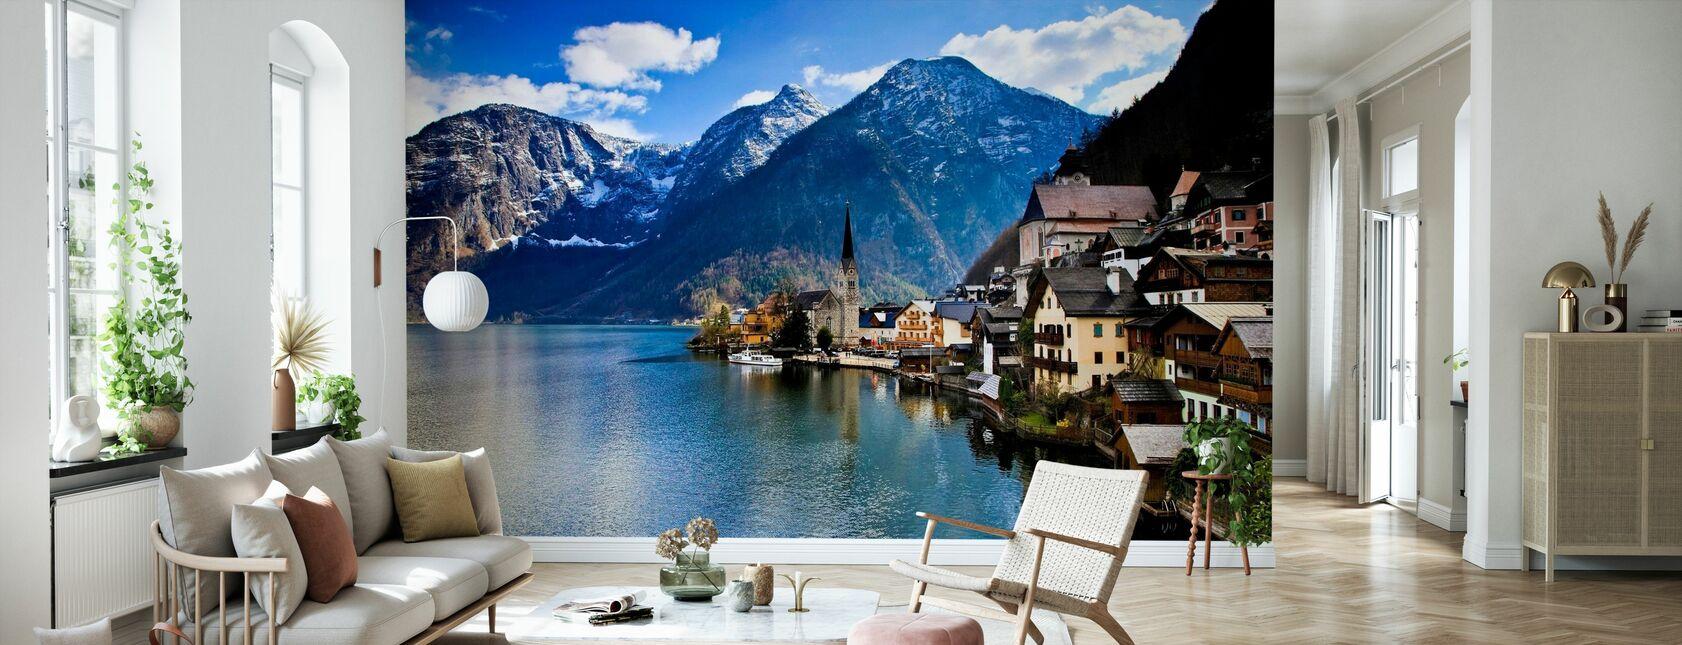 Small Austrian Mountain Village - Wallpaper - Living Room